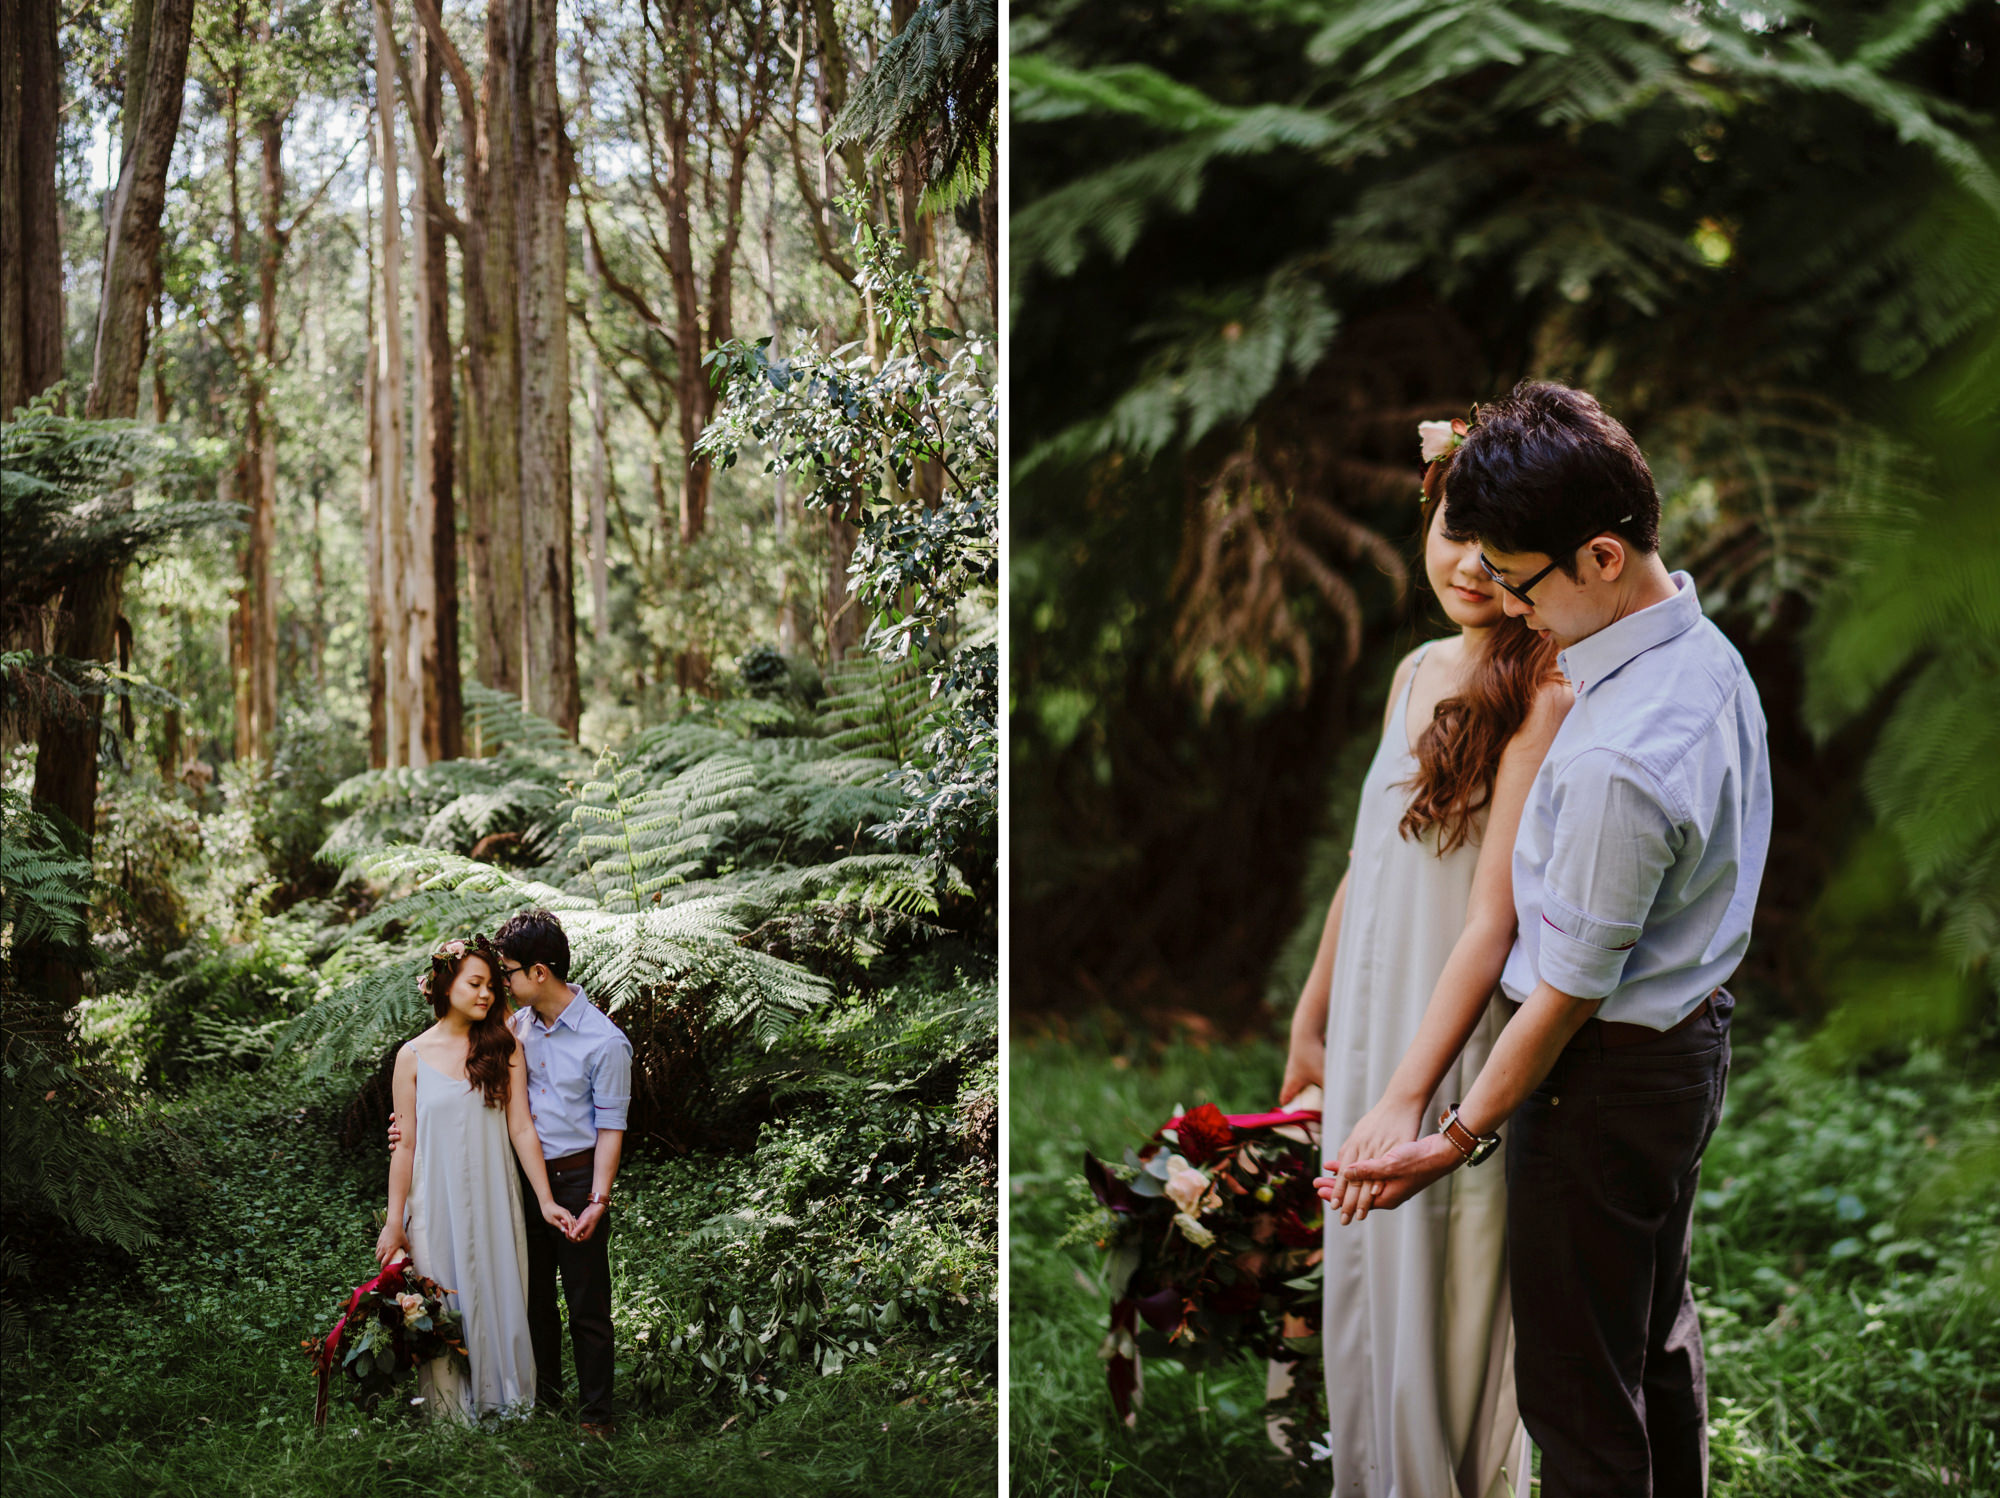 014-melbourne-engagement-wedding-photography